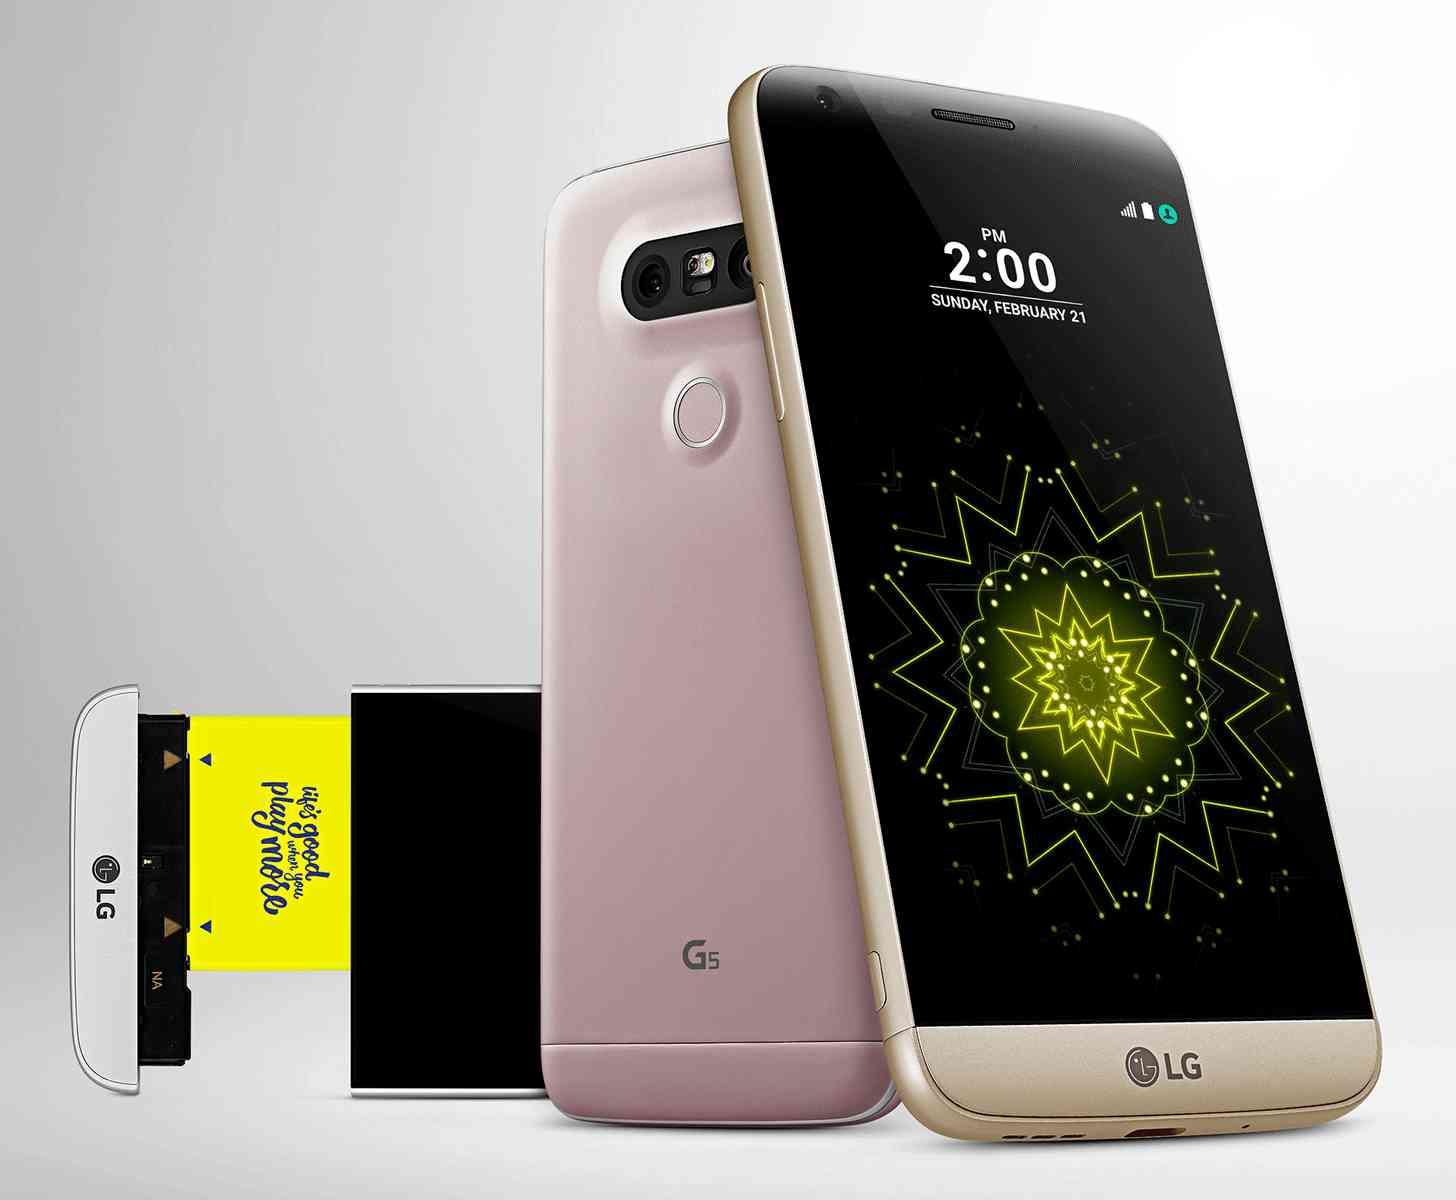 LG G5 official